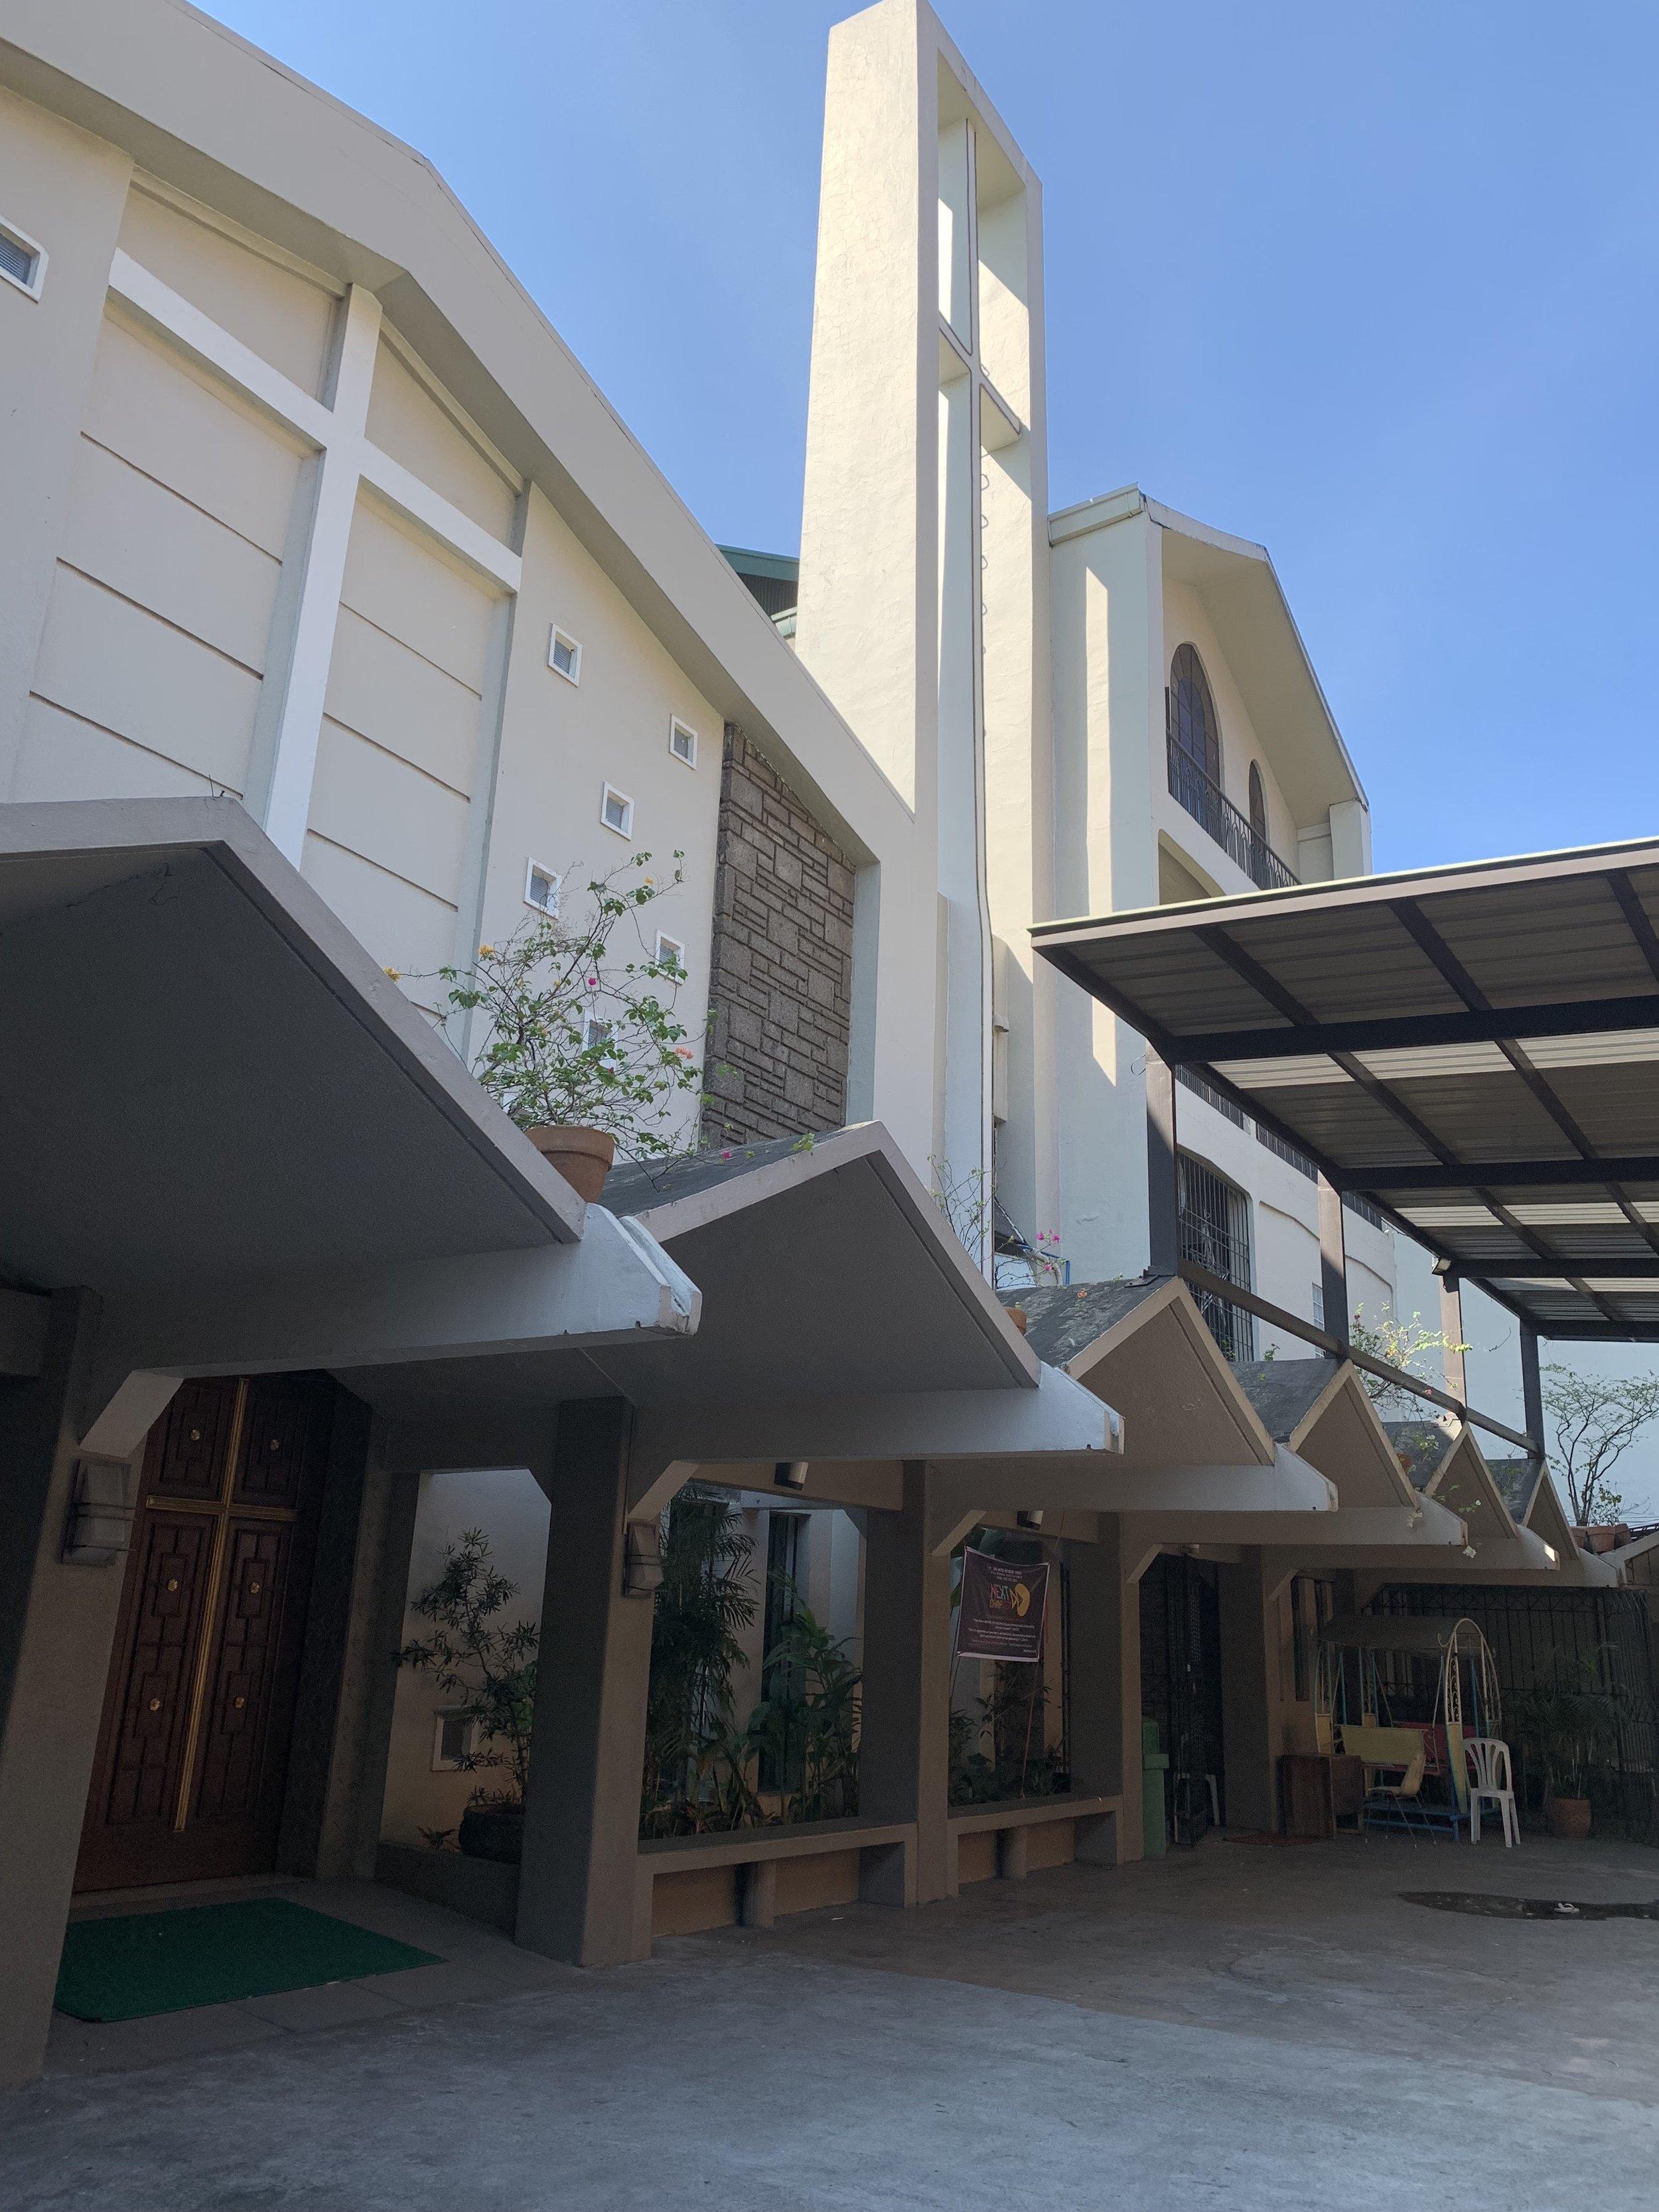 St. John United Methodist Church, circa 2019.